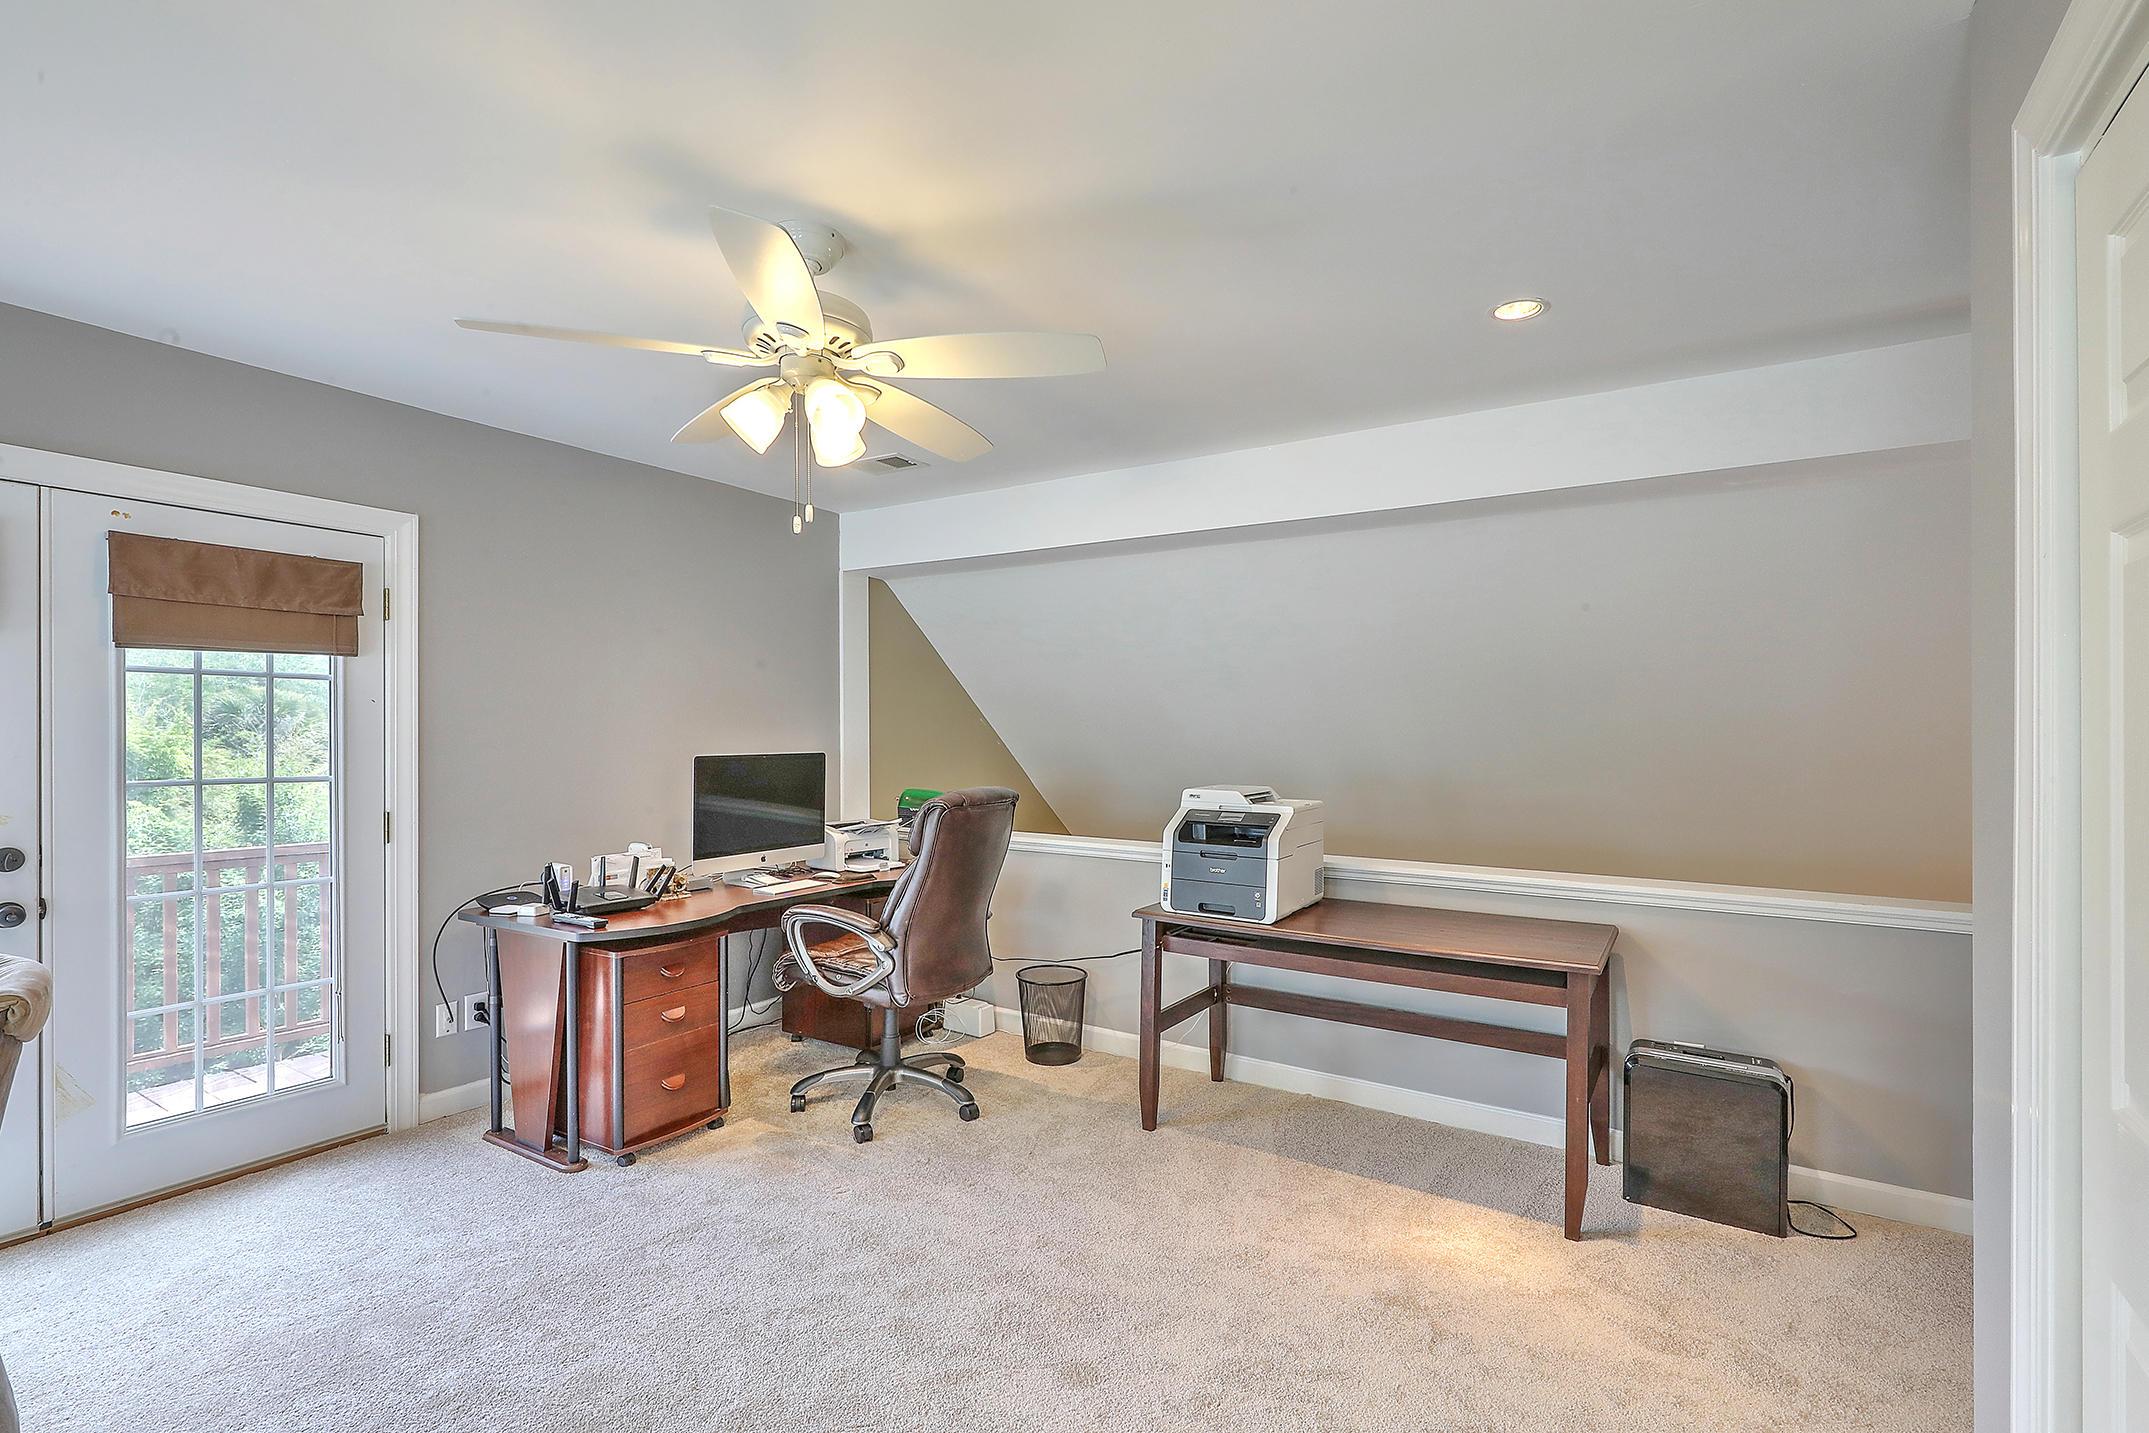 Stono Pointe Homes For Sale - 2660 Burden Creek, Johns Island, SC - 40